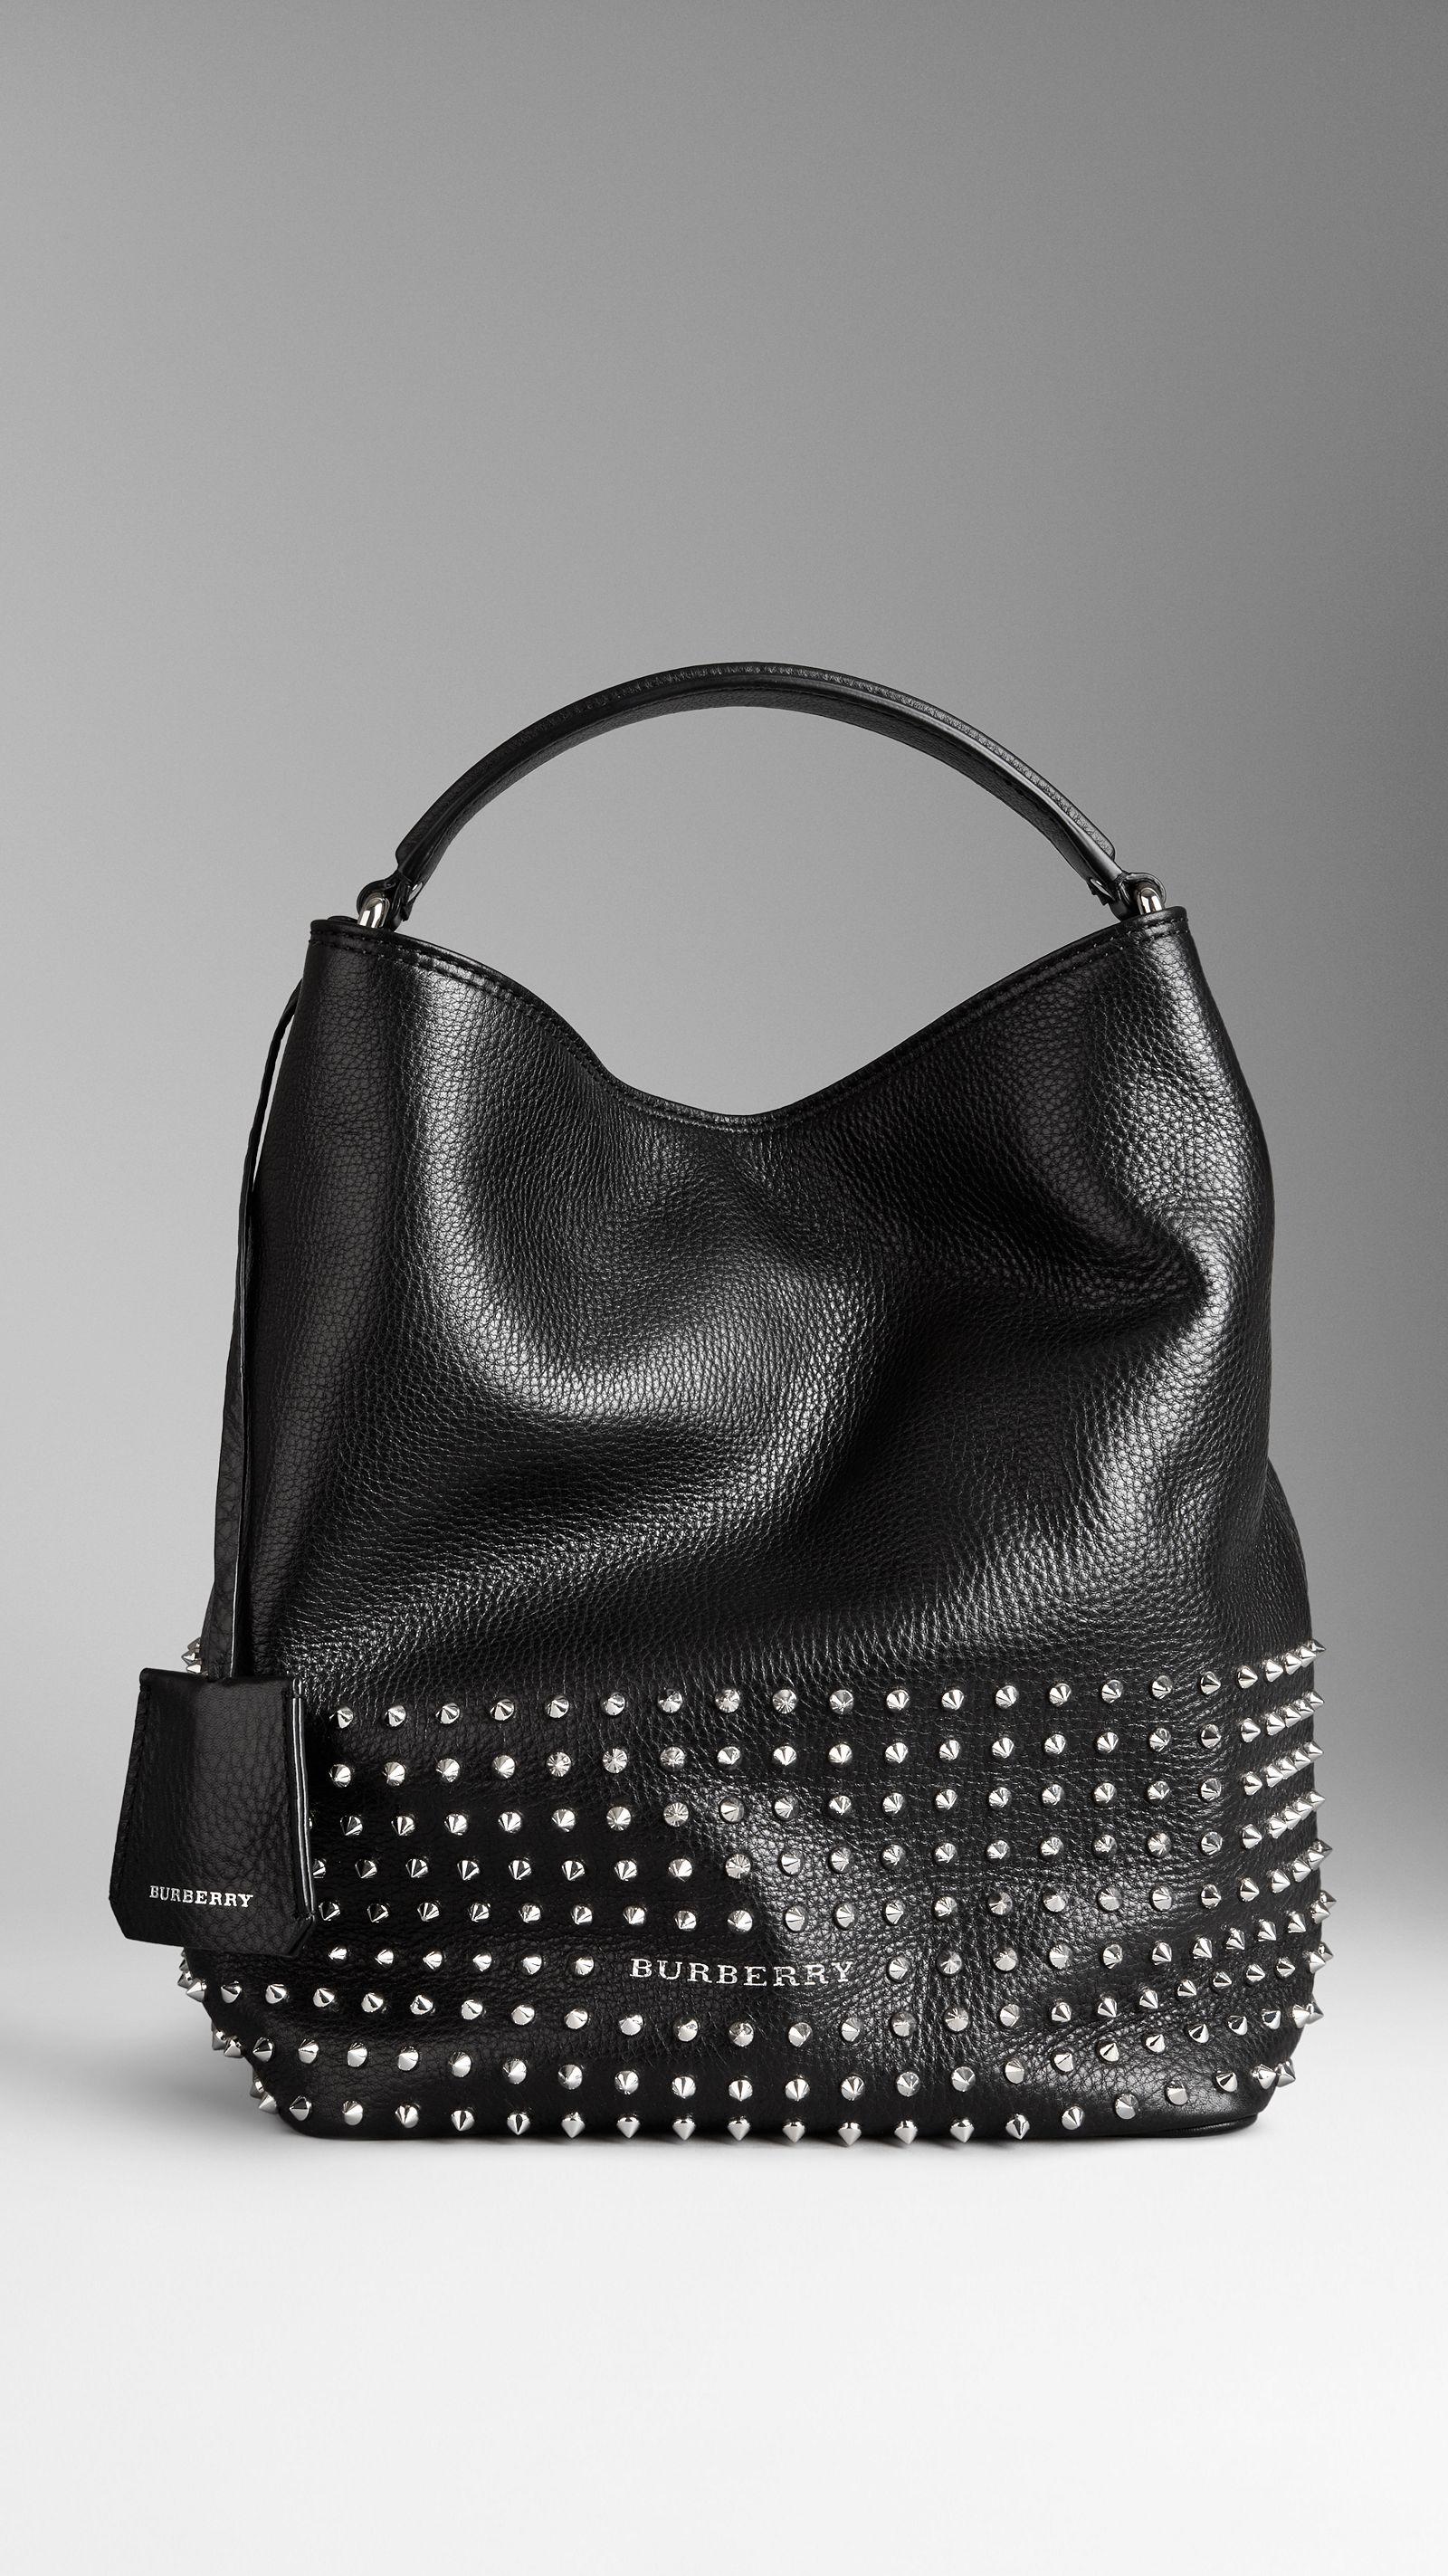 burberry bag black leather